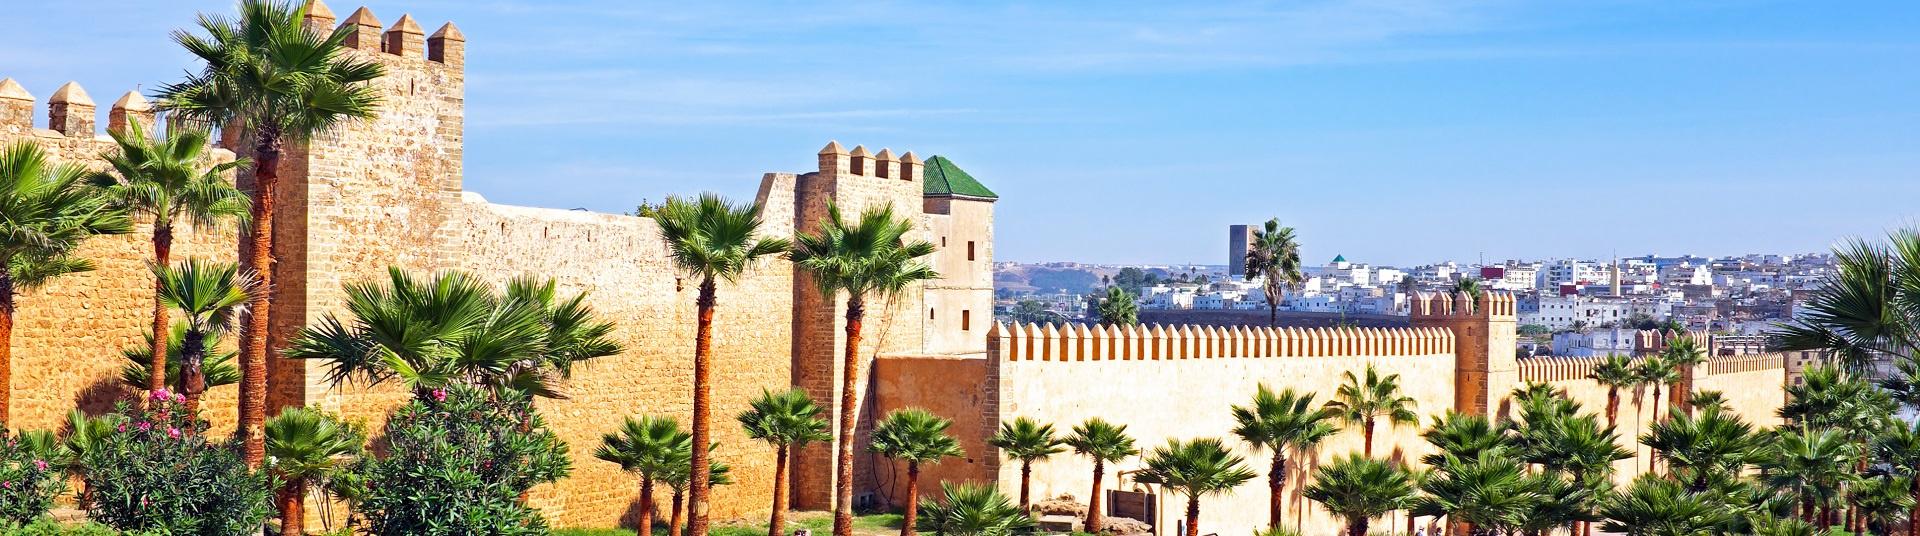 Week-end pas cher Rabat